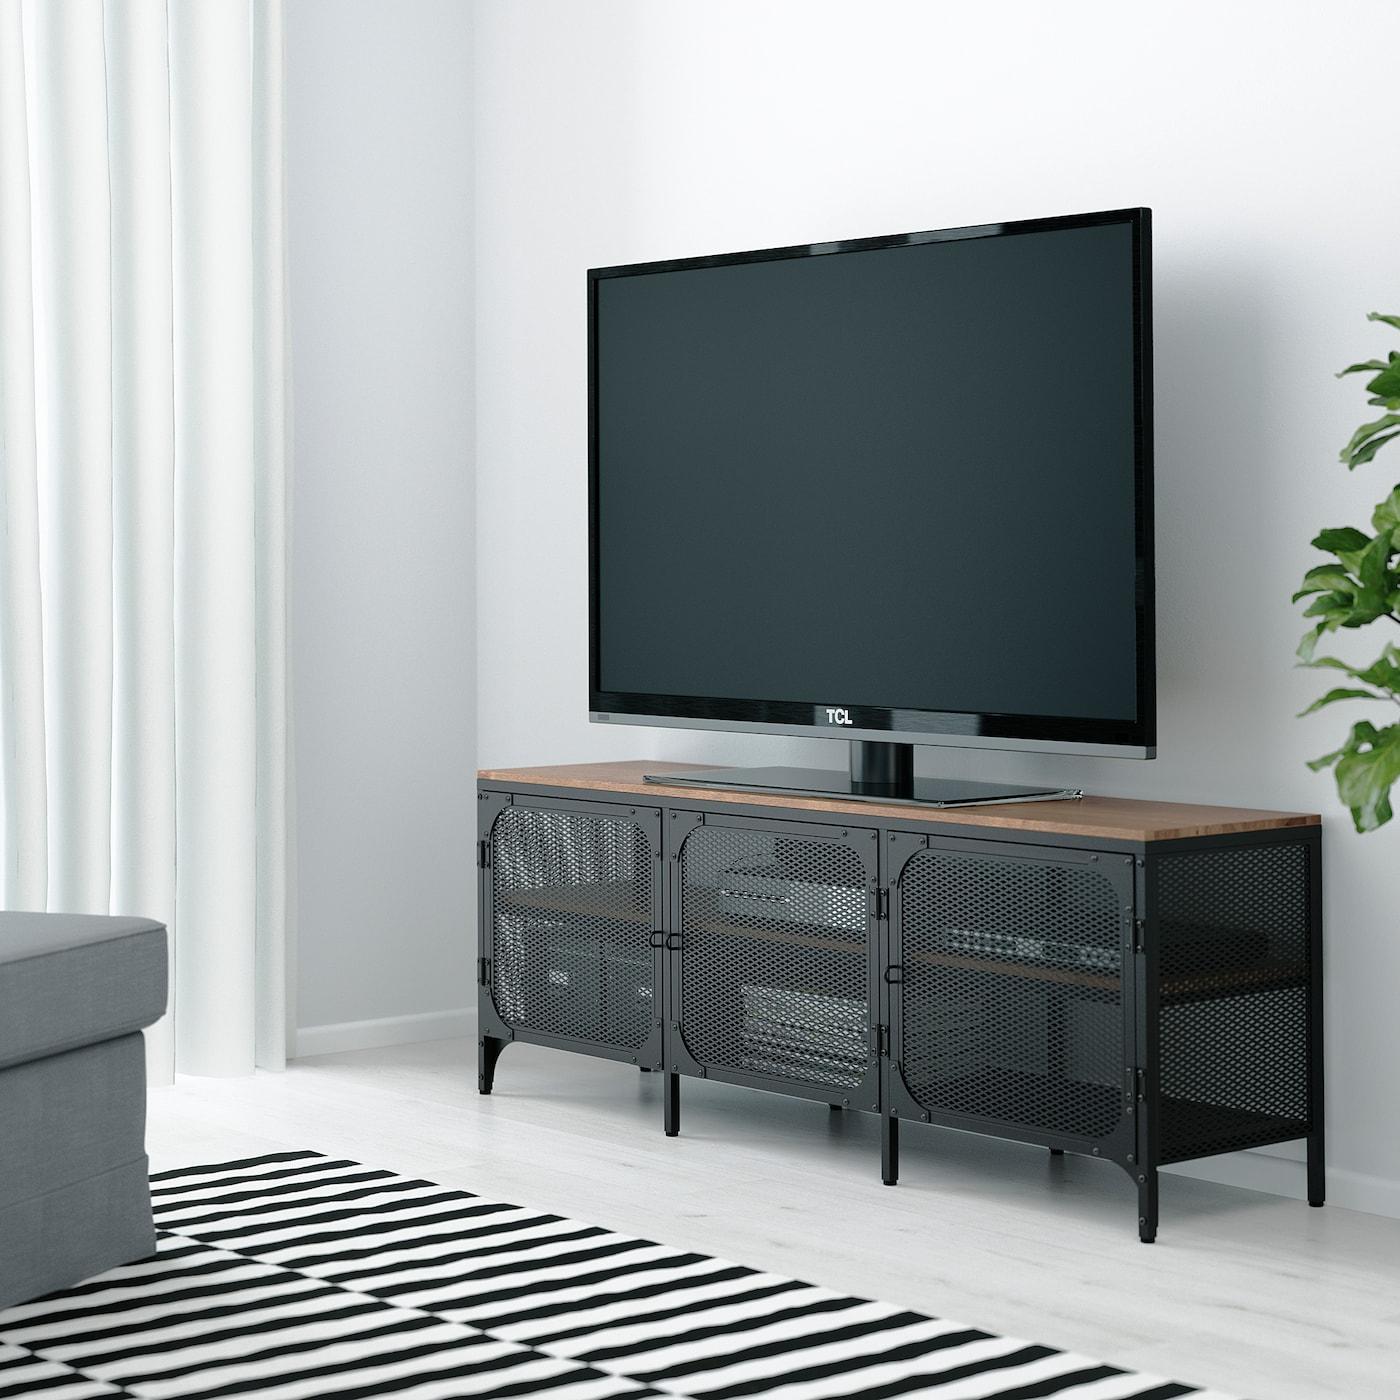 Fjallbo Banc Tv Noir 150x36x54 Cm Ikea